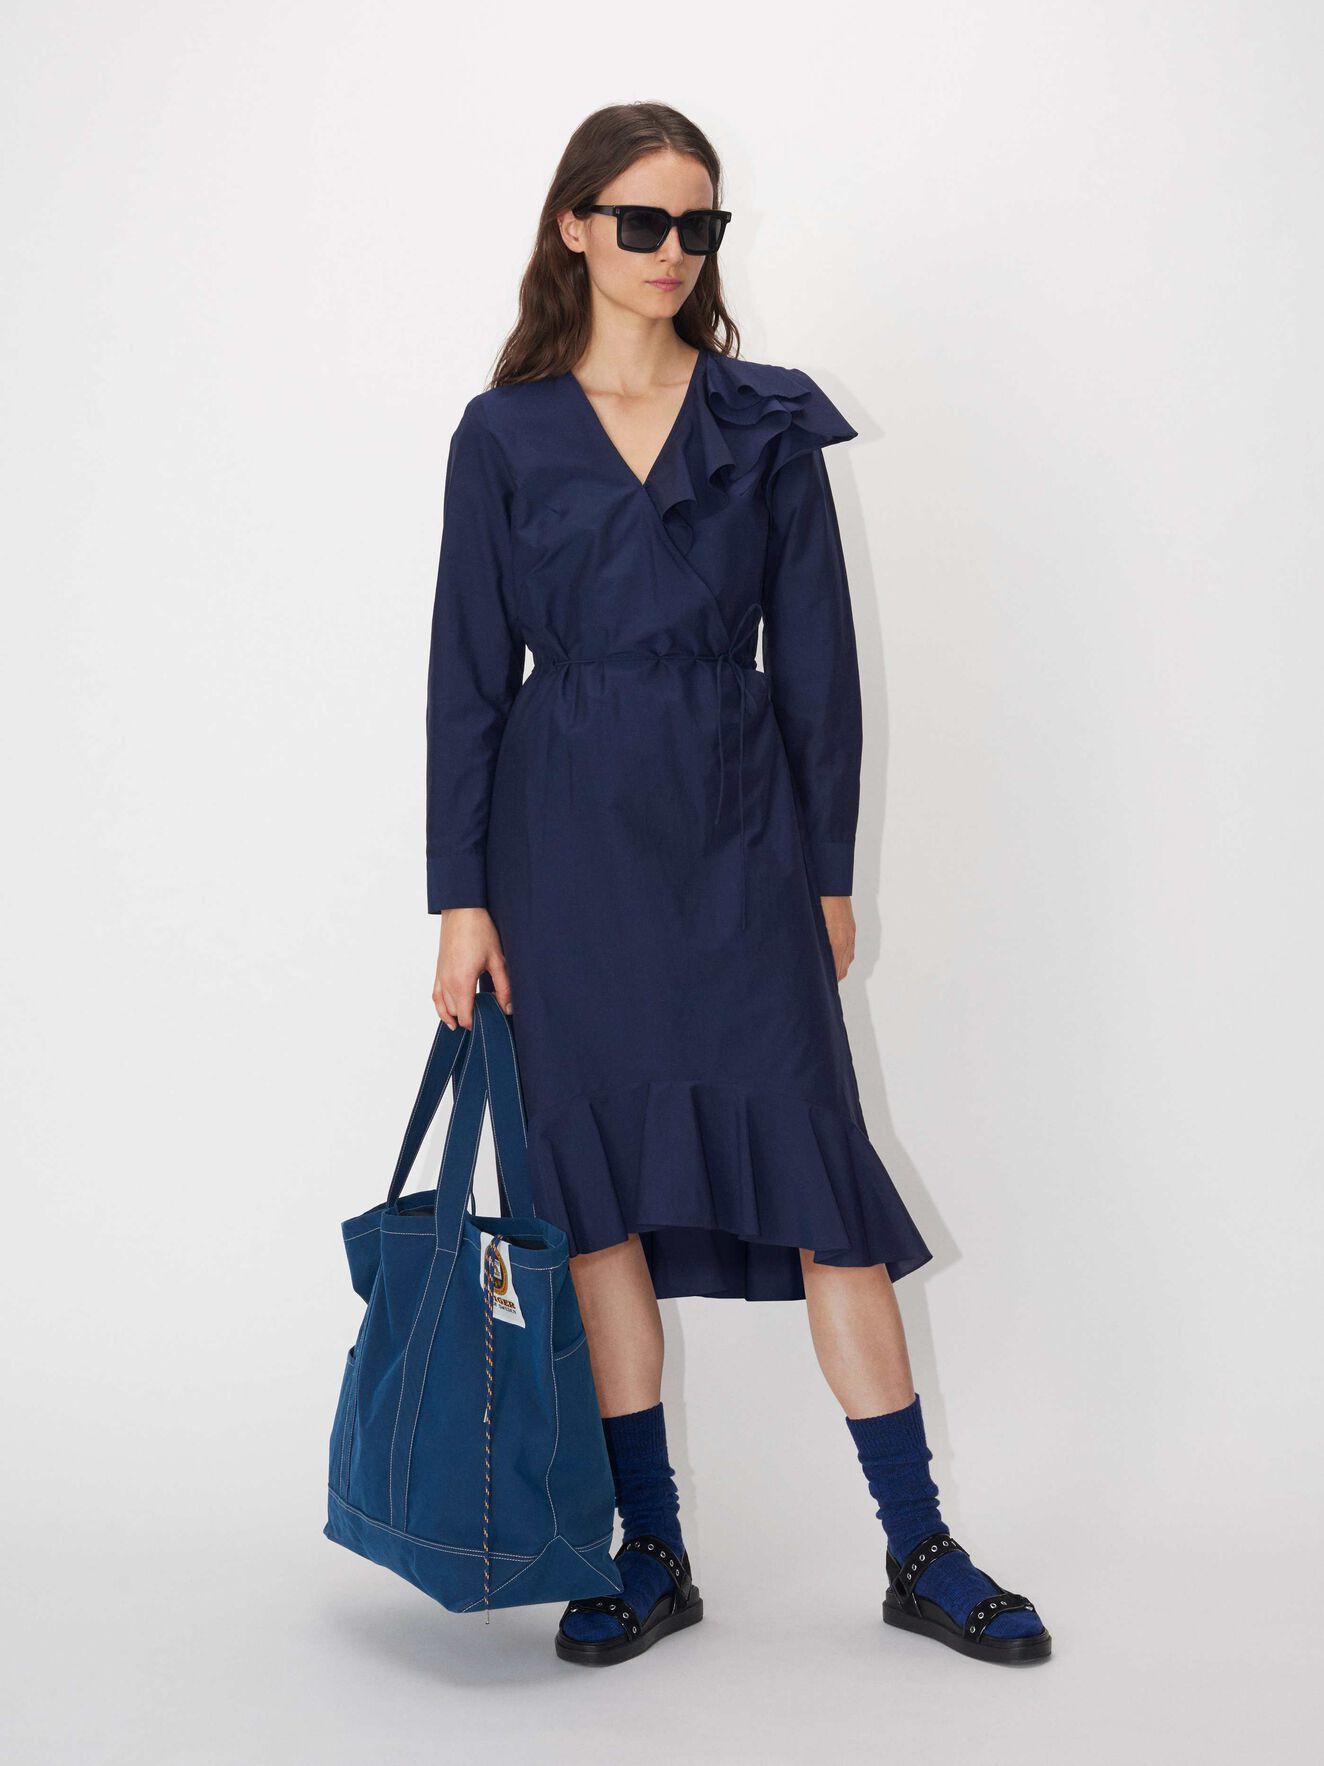 4f601a8d2072 Merzig Dress. 2 999 sek. Nopal Trousers in Light blue from Tiger of Sweden